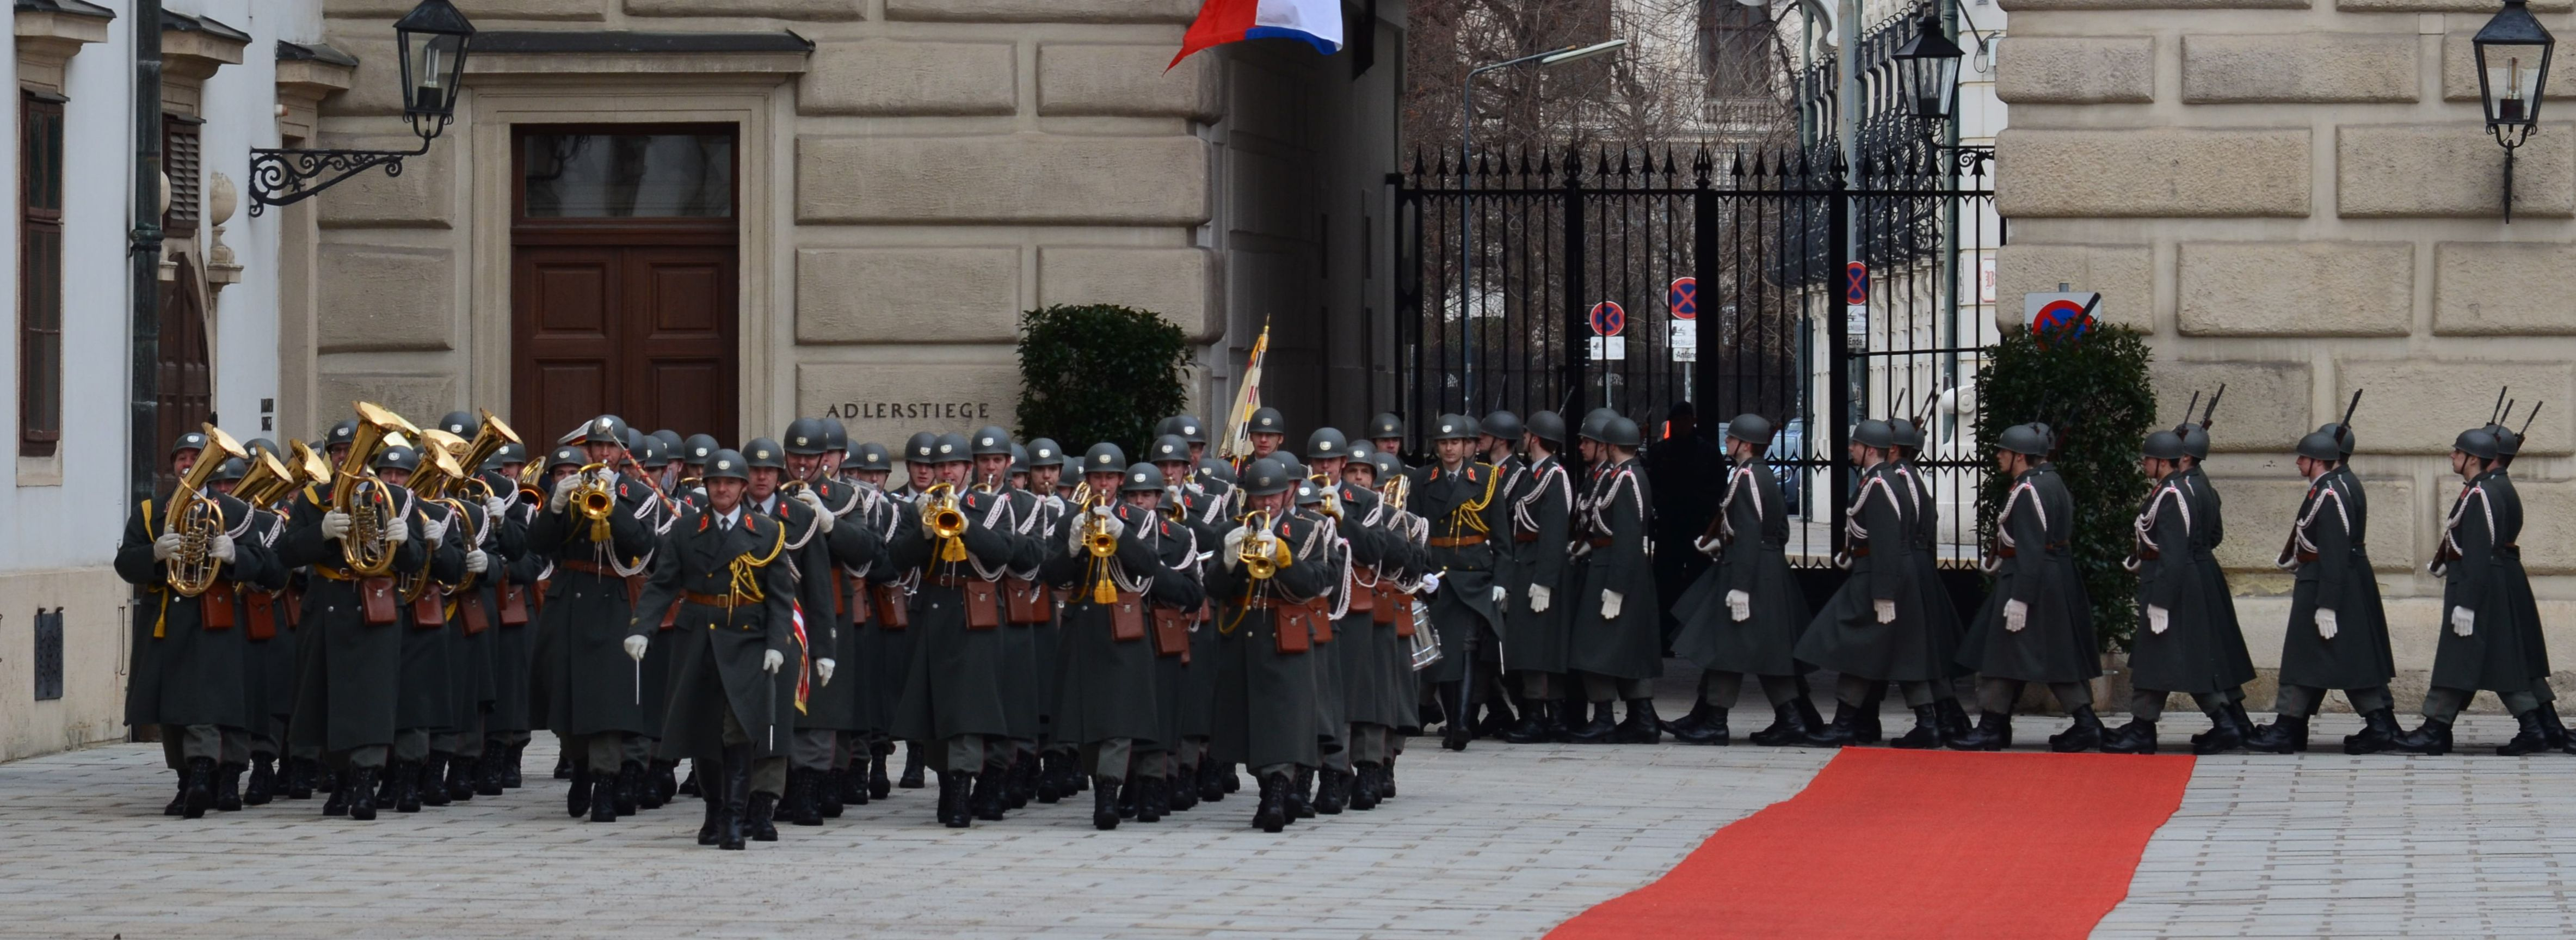 Staatsempfang des slowenischen Präsidenten in Wien am 6. Februar 2013